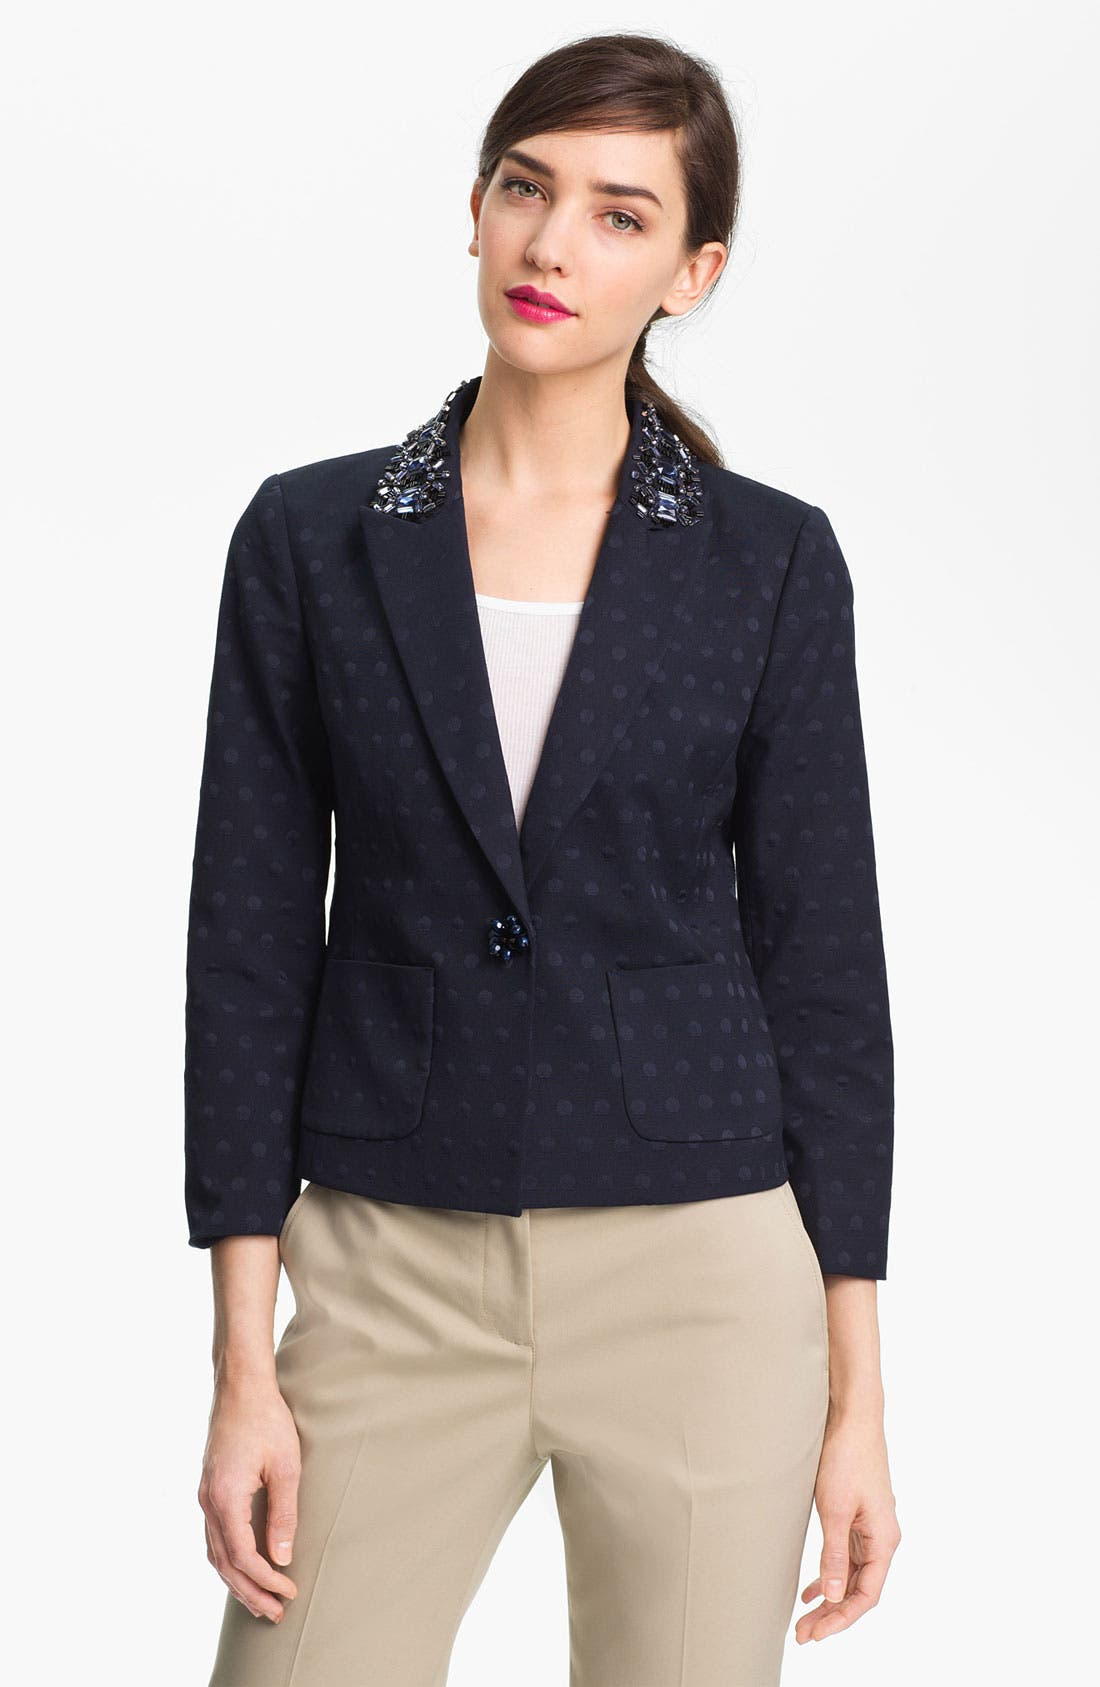 Main Image - Tory Burch 'Jaclyn' Embellished Blazer